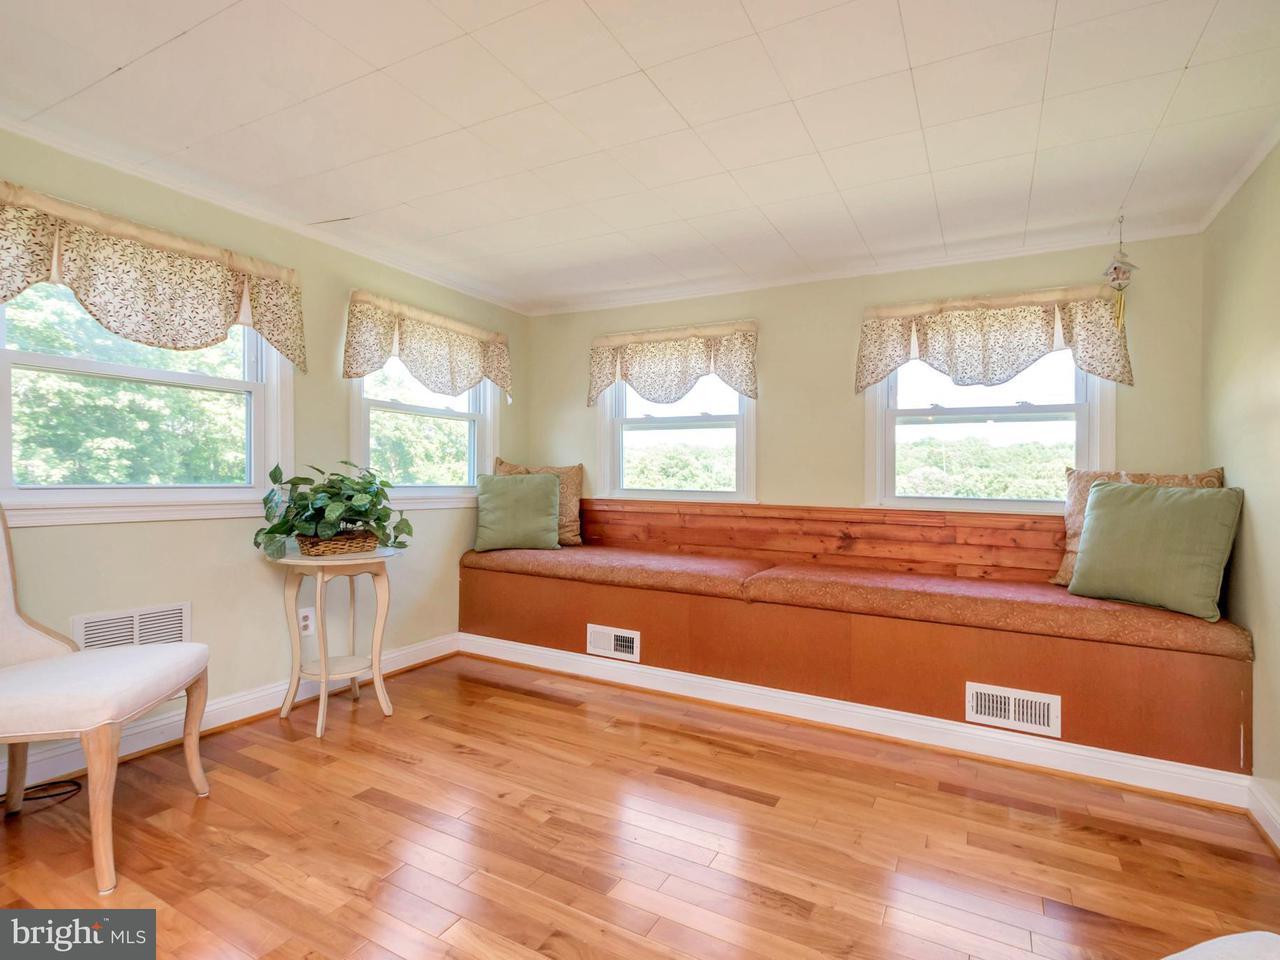 Single Family for Sale at 13347 Sillamon Rd Goldvein, Virginia 22720 United States